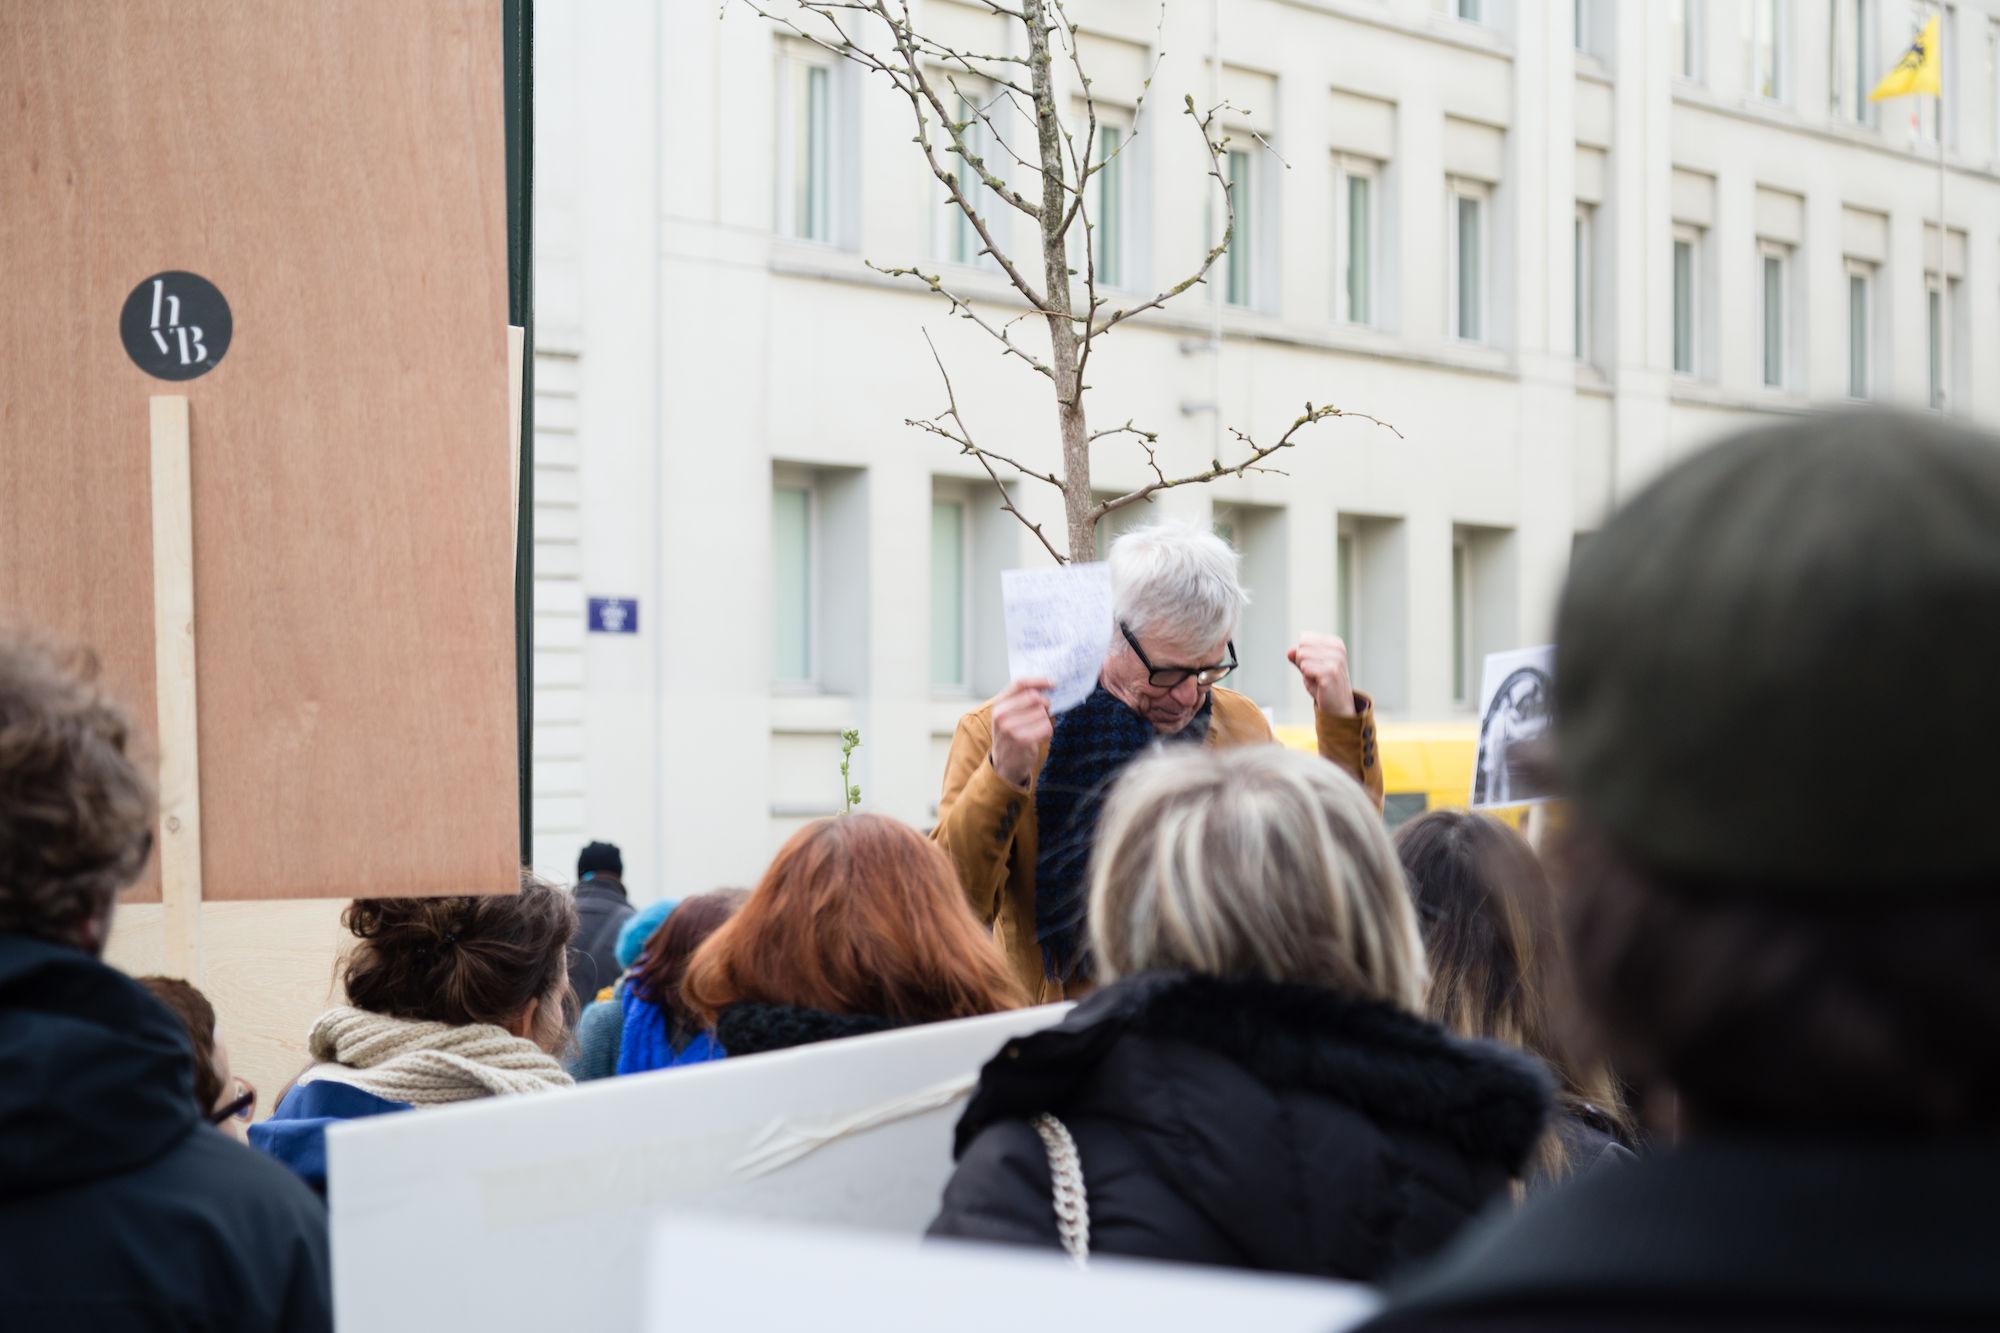 Manifestatie #beloftemaaktschuld